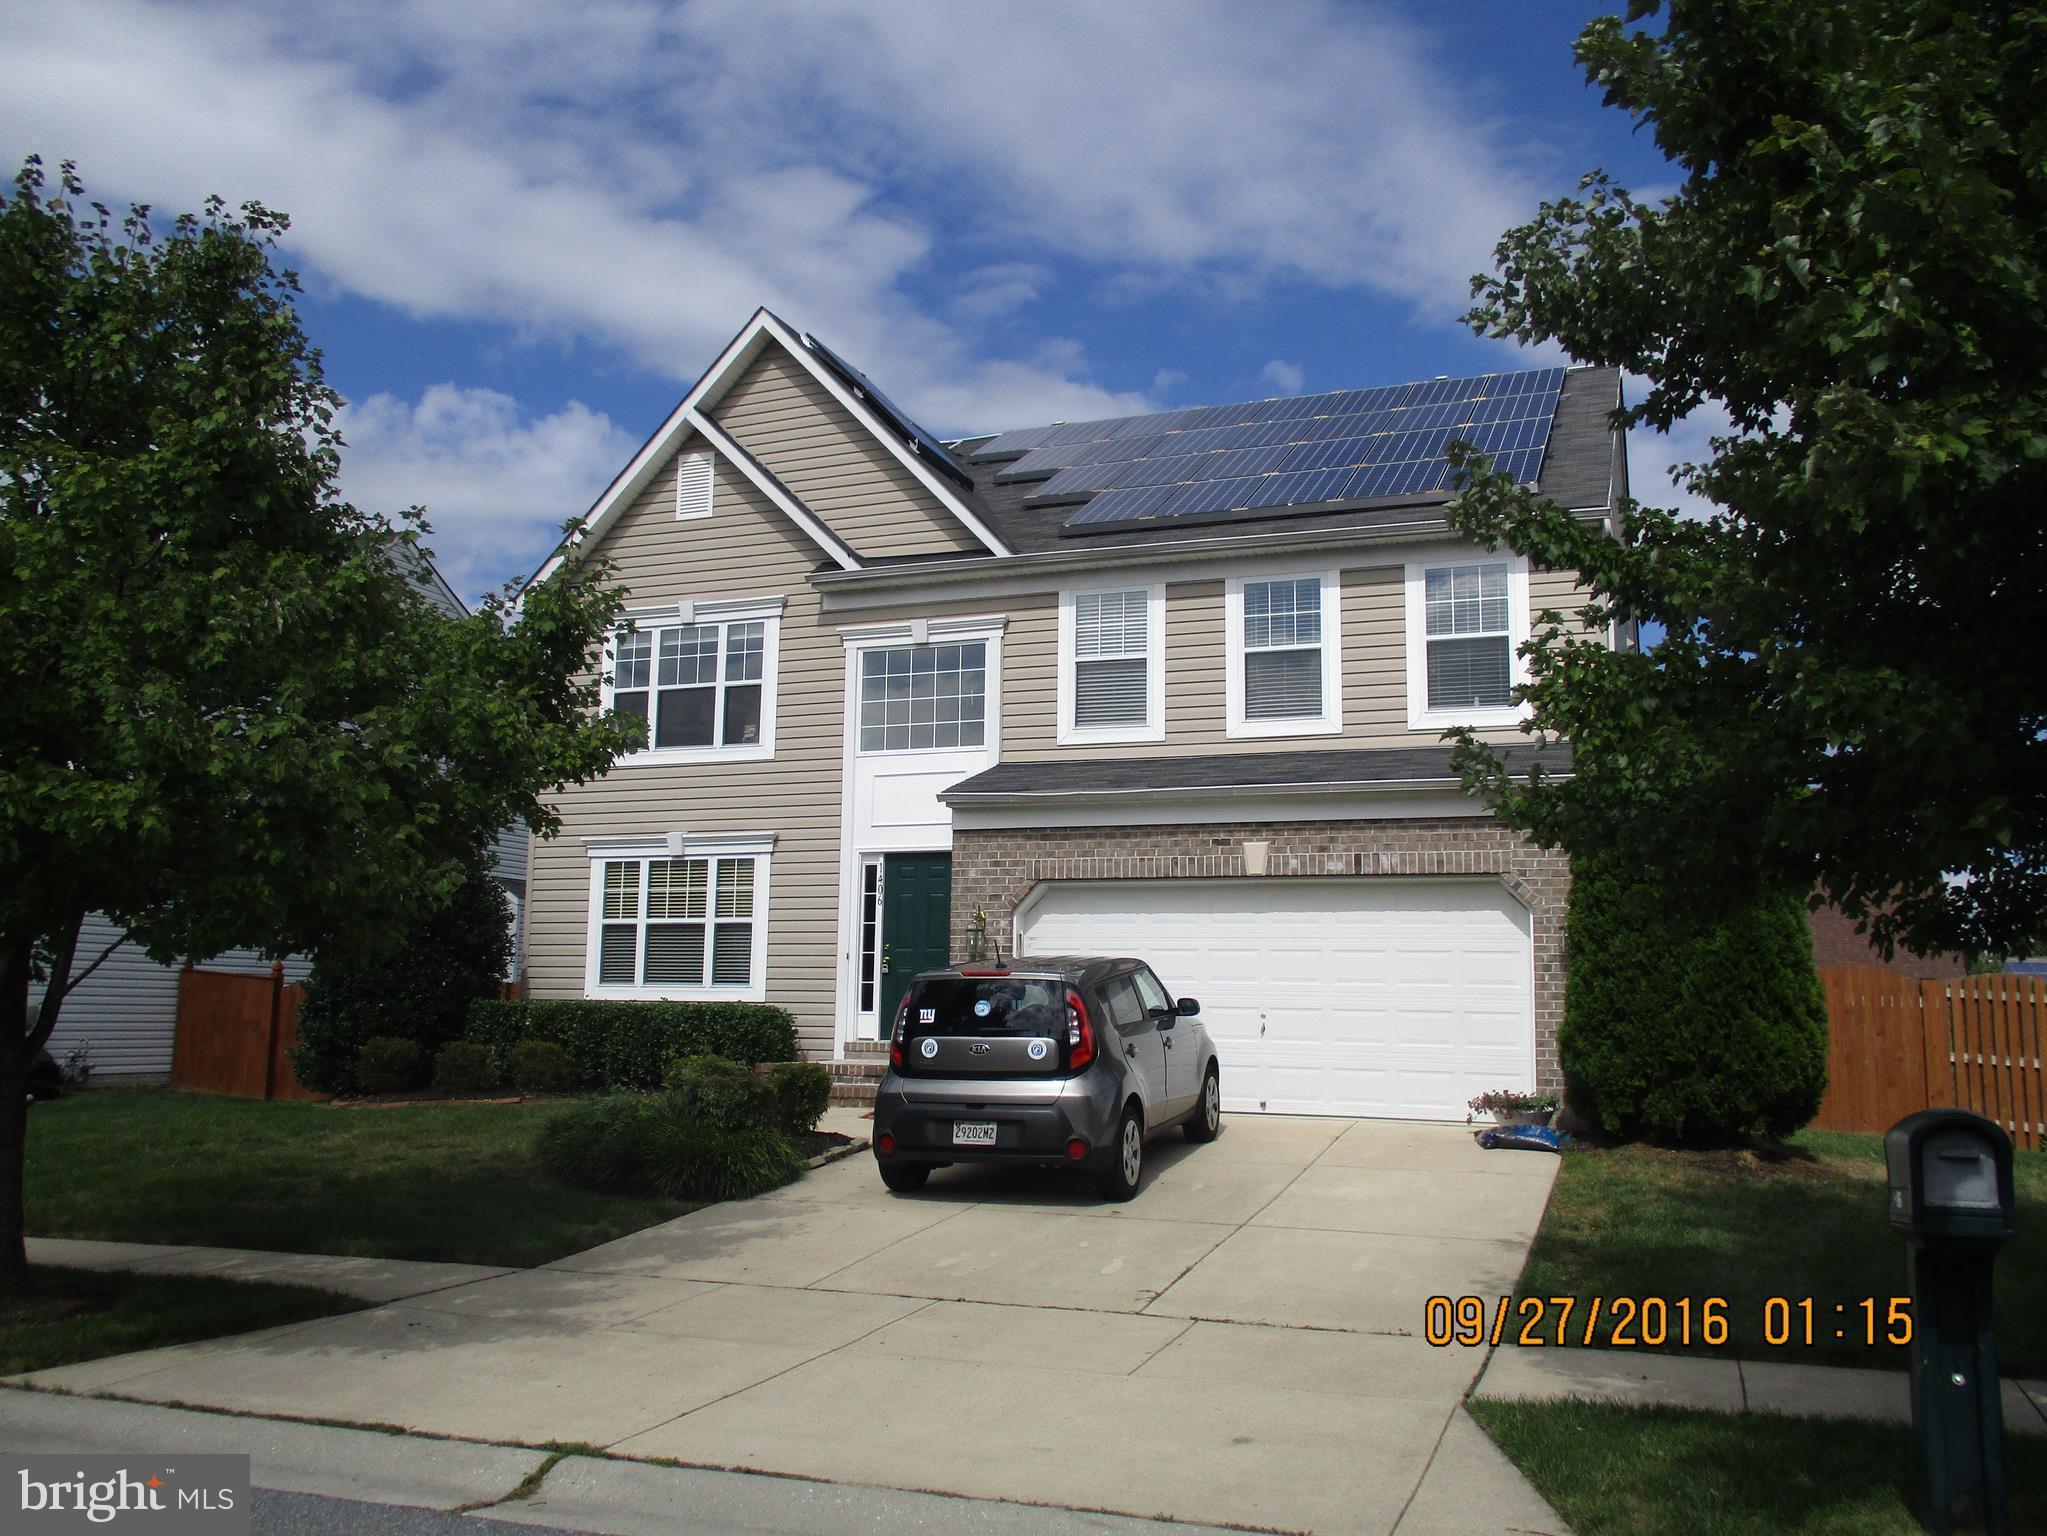 1406 Bush Rd, Severn, MD, 21144